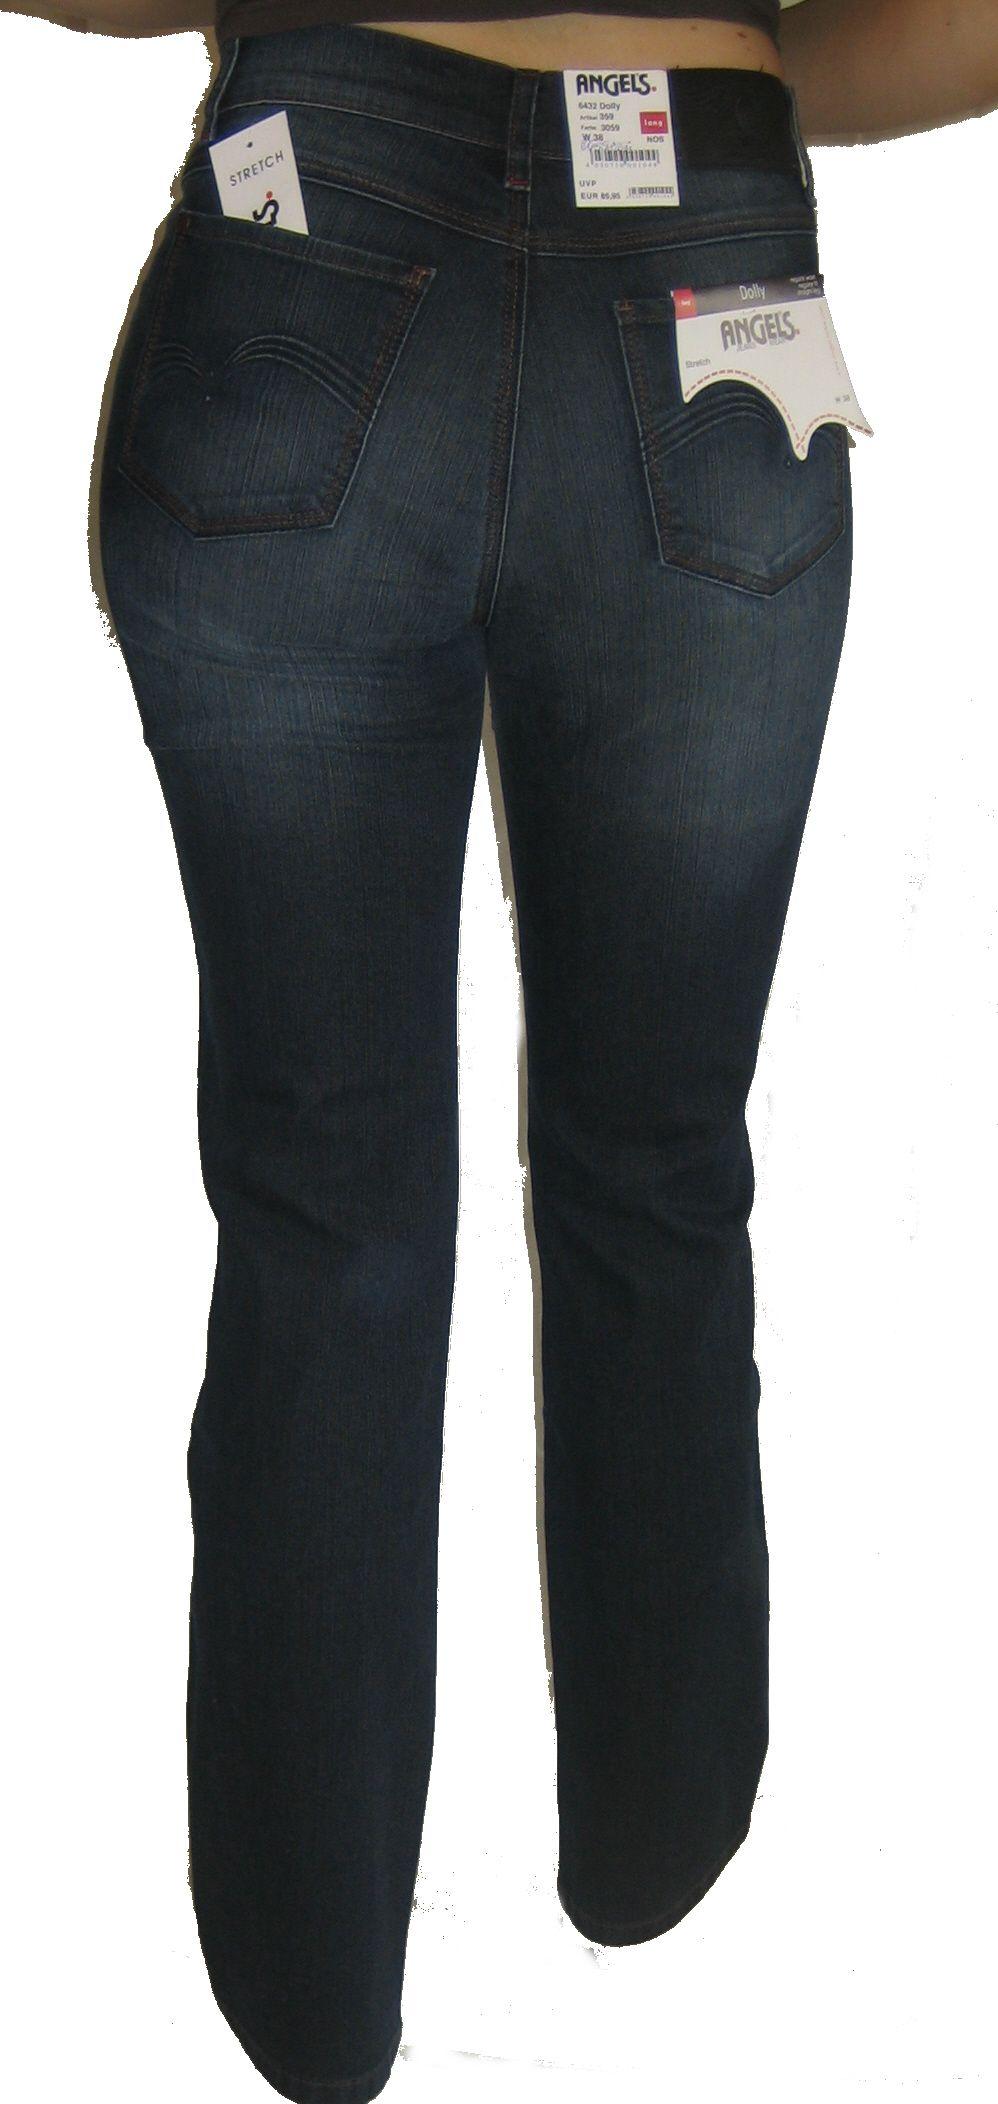 Angels Jeans Dolly 6428 short Stretch dunkelblau Art359